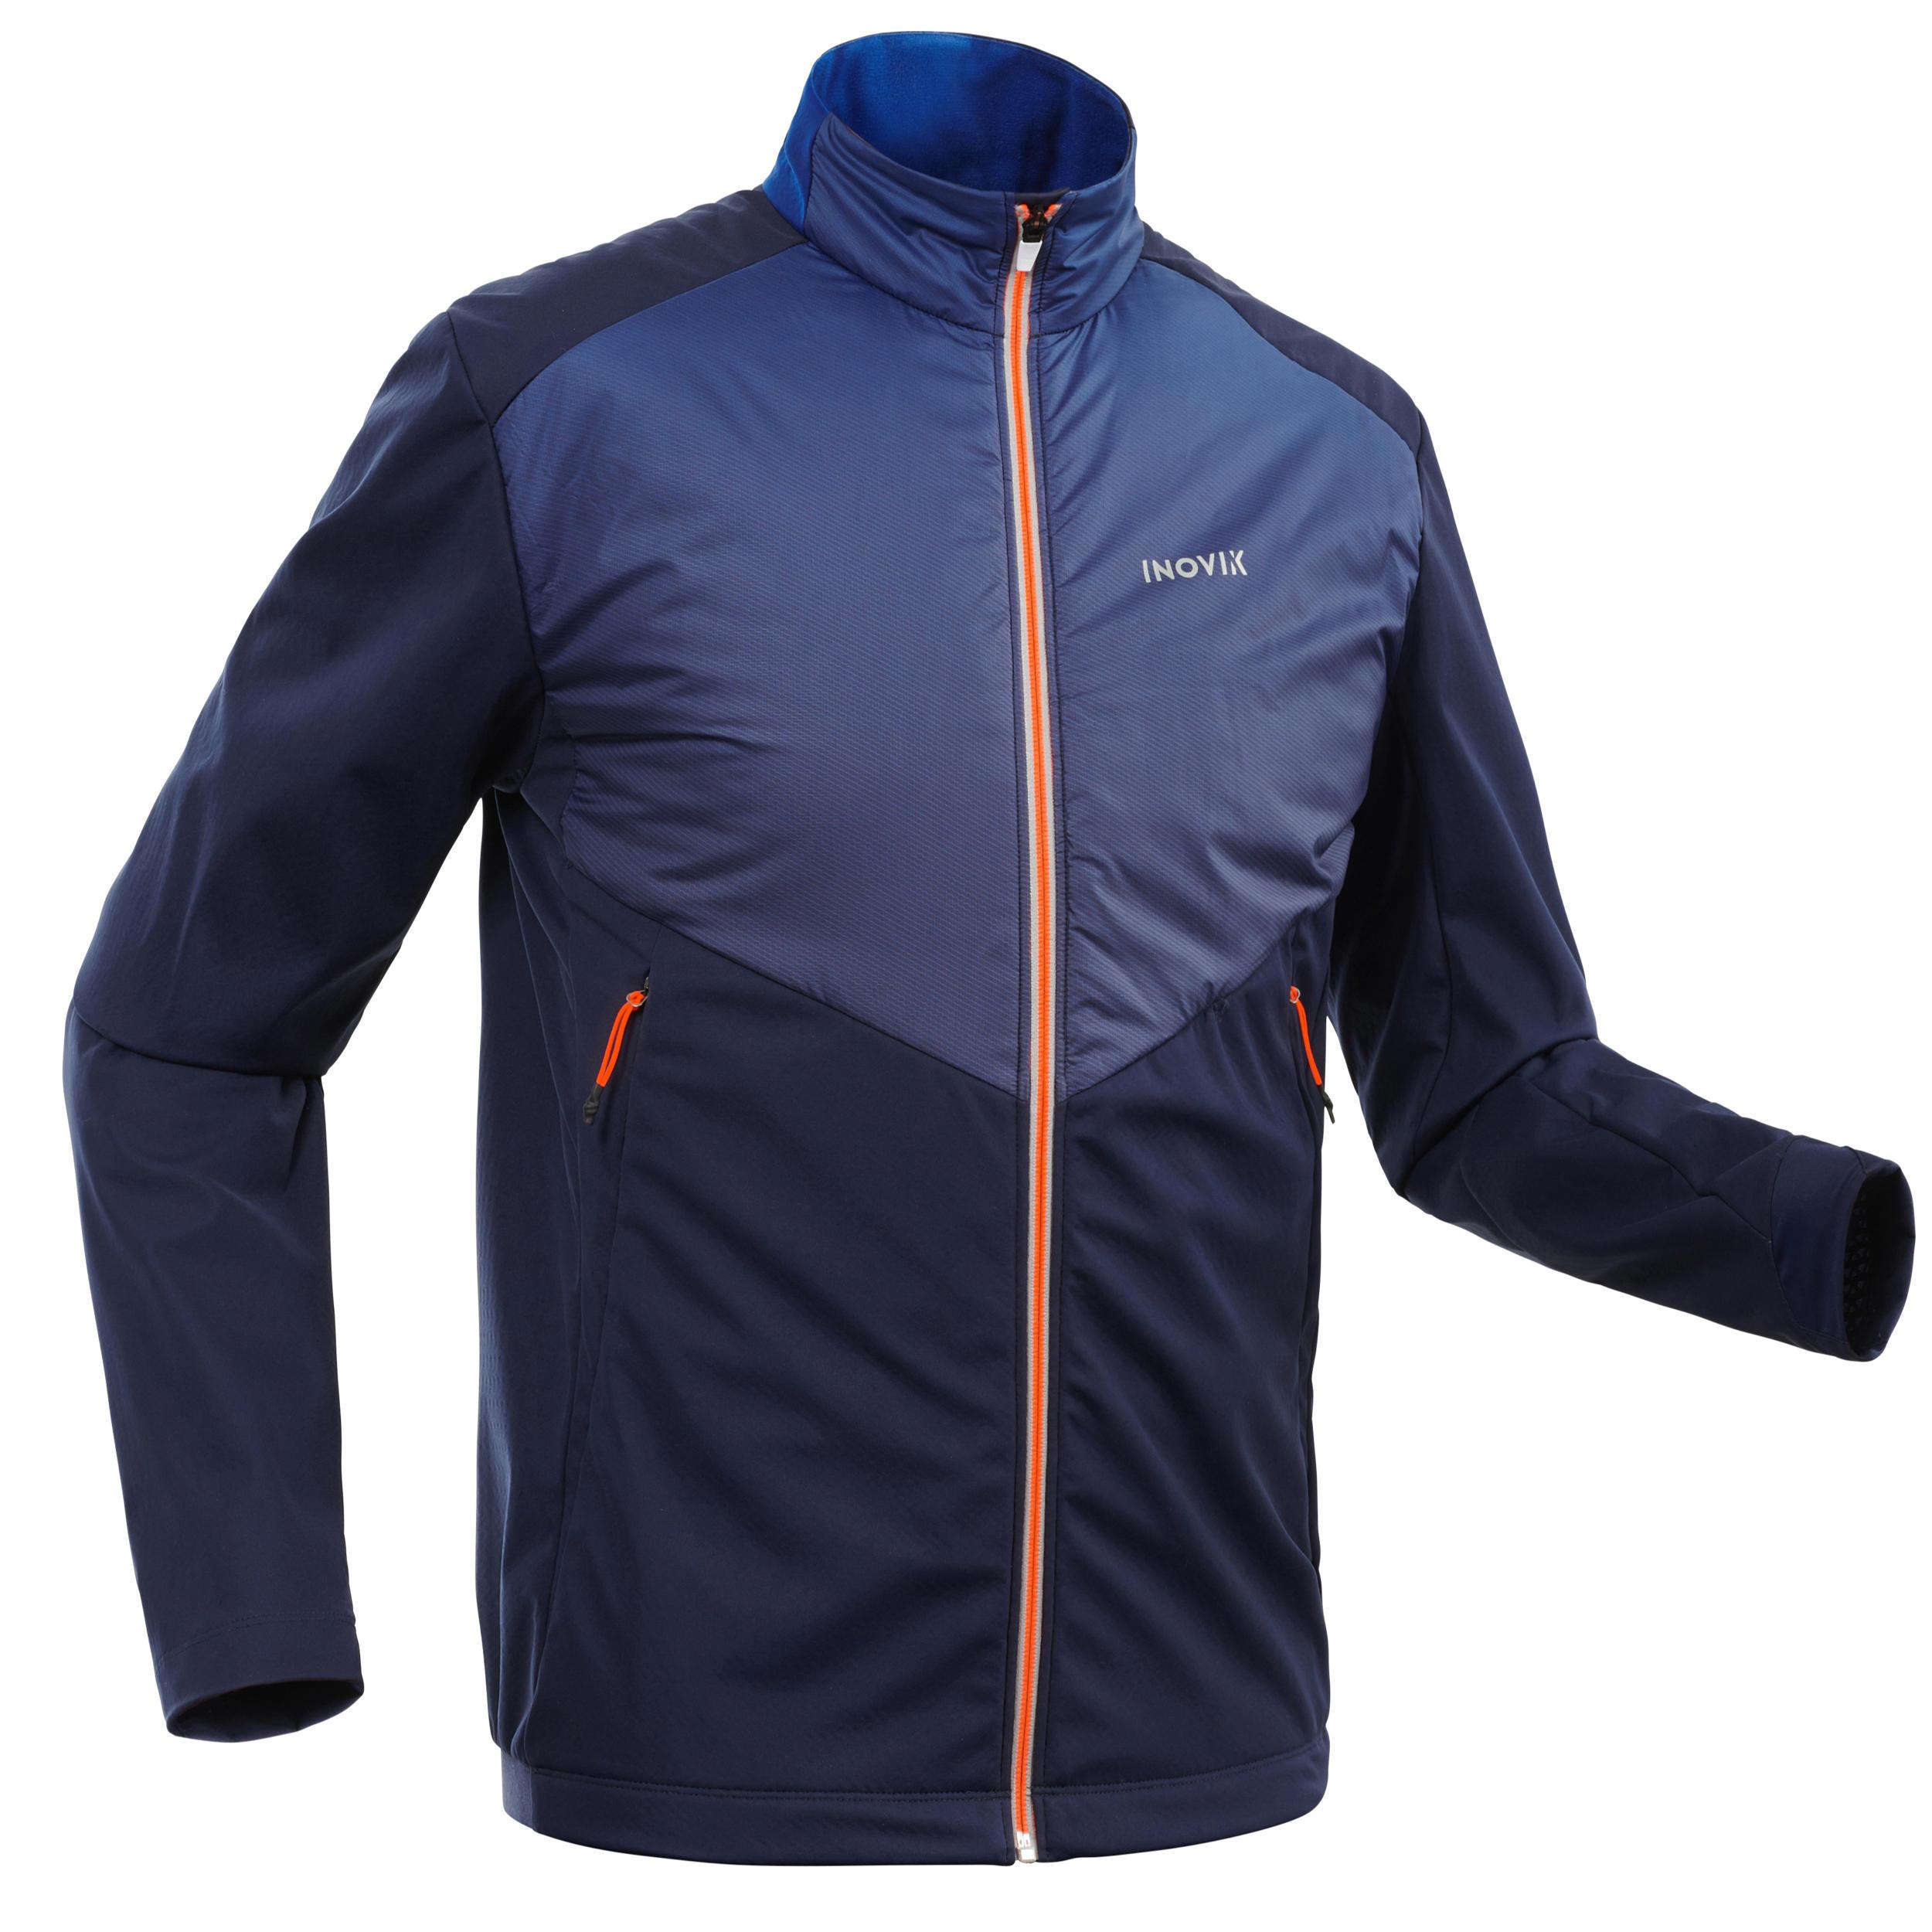 Veste de ski de fond bleu xc s jacket 550 homme inovik